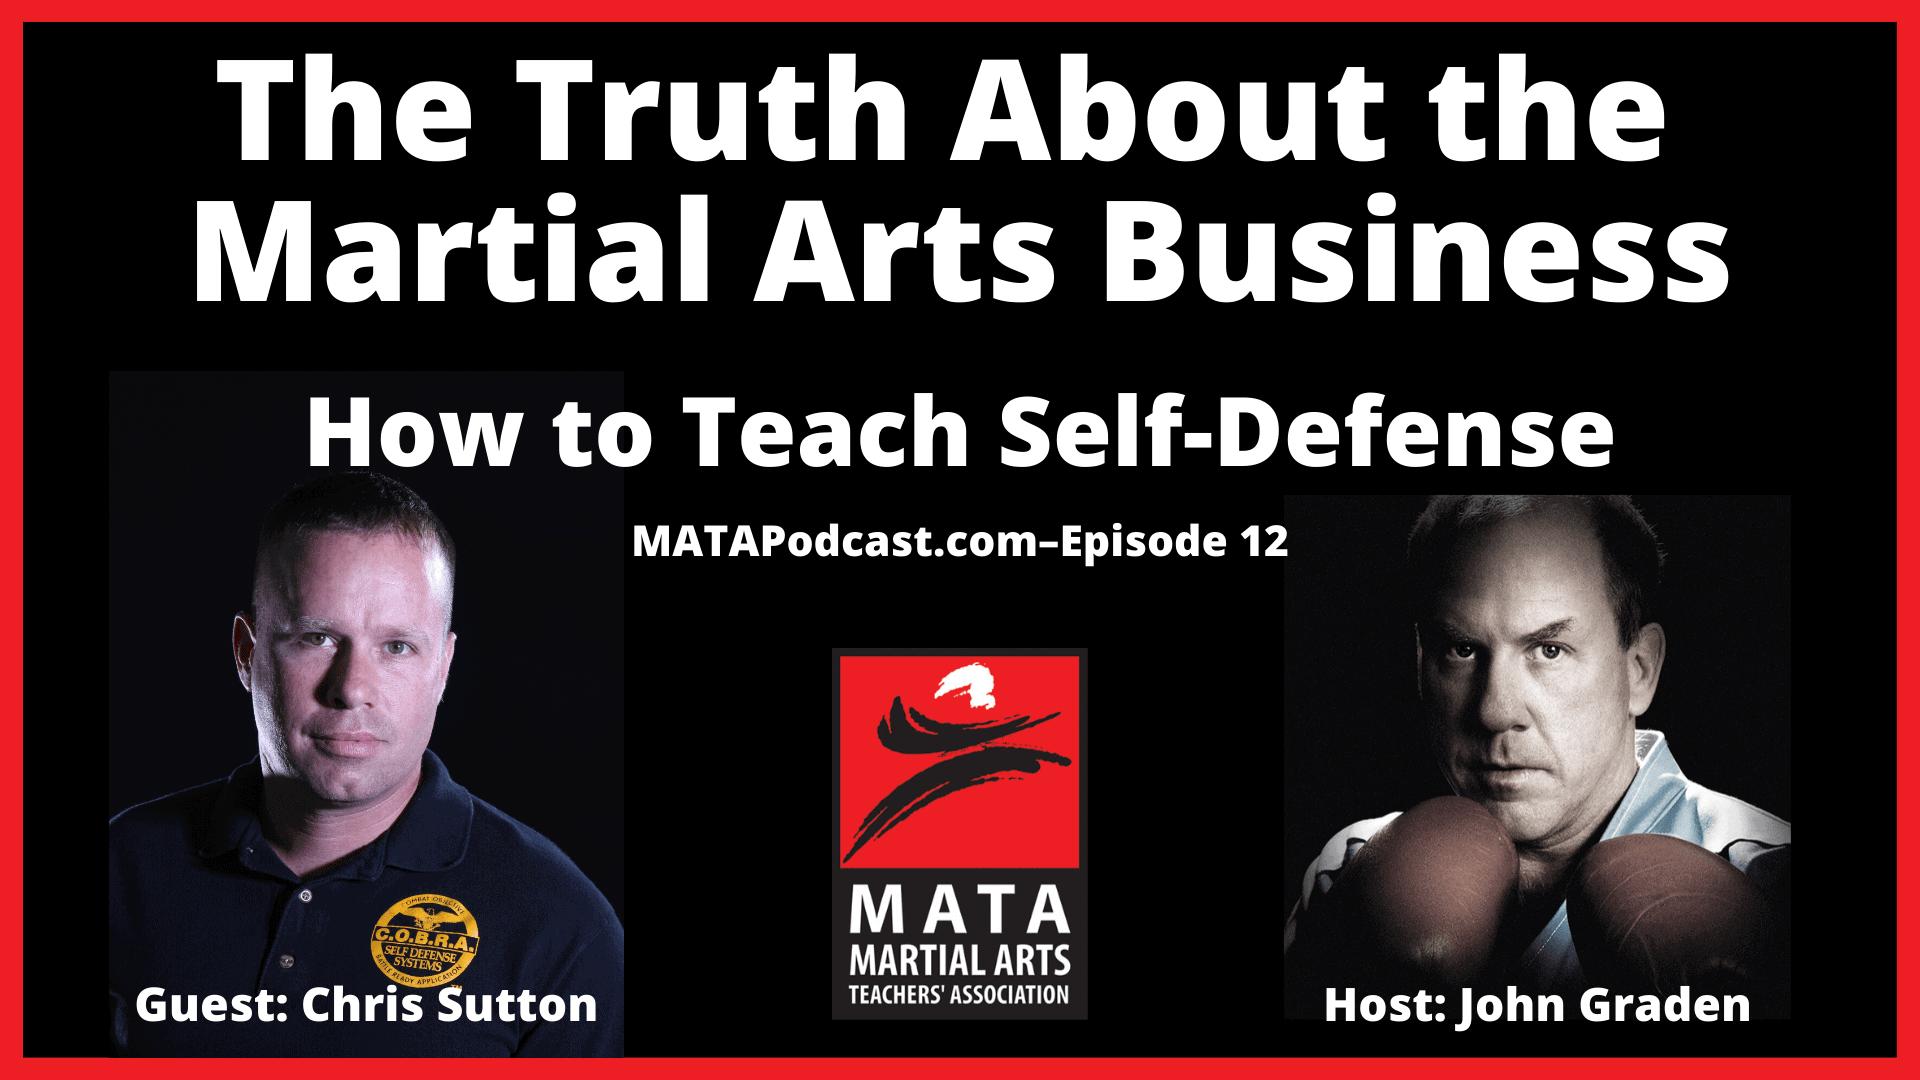 how to teach self-defense